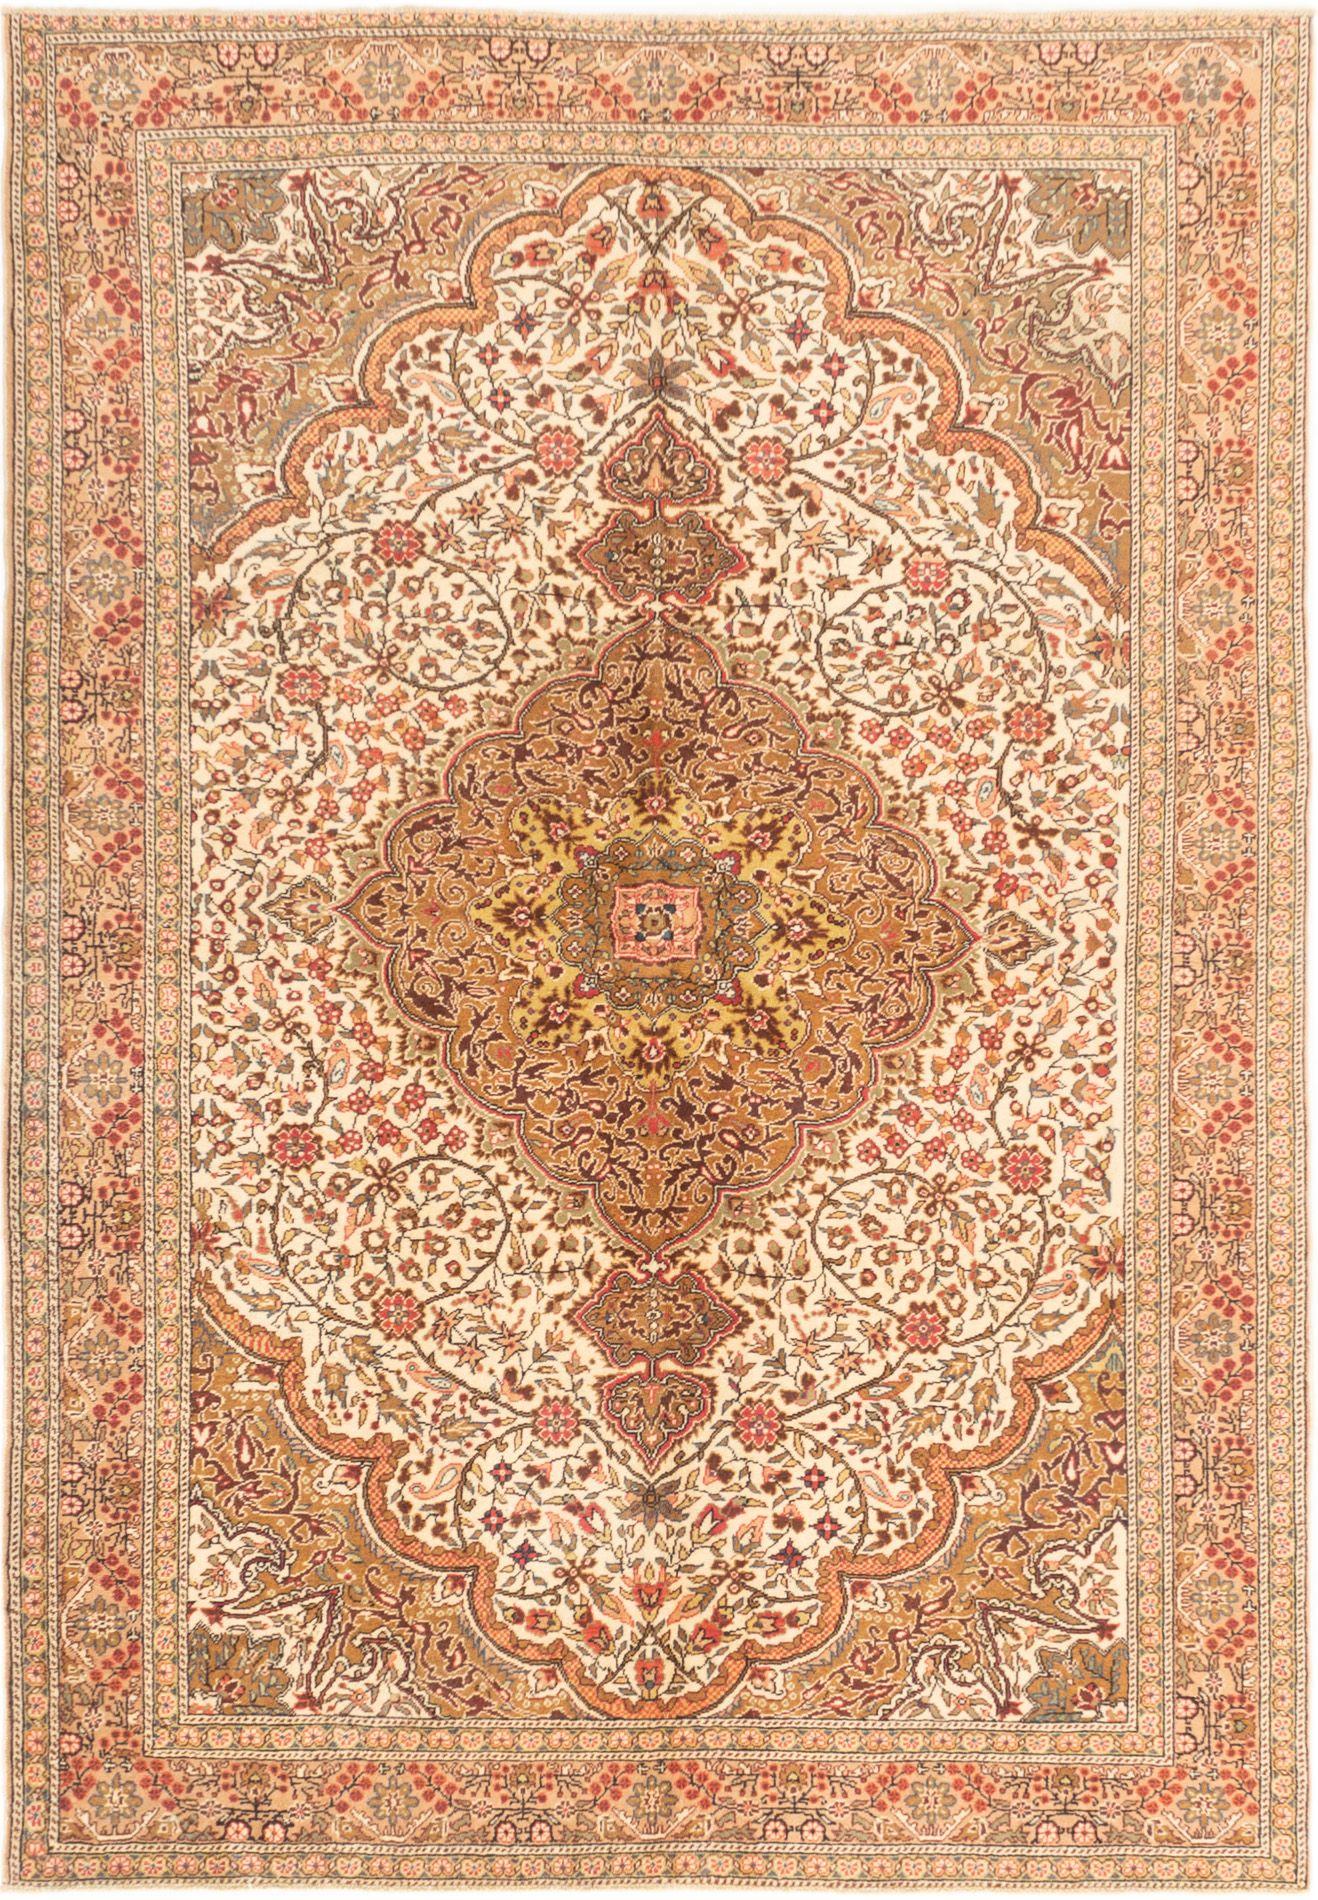 "Hand-knotted Anatolian Cream Wool Rug 6'7"" x 9'7"" Size: 6'7"" x 9'7"""